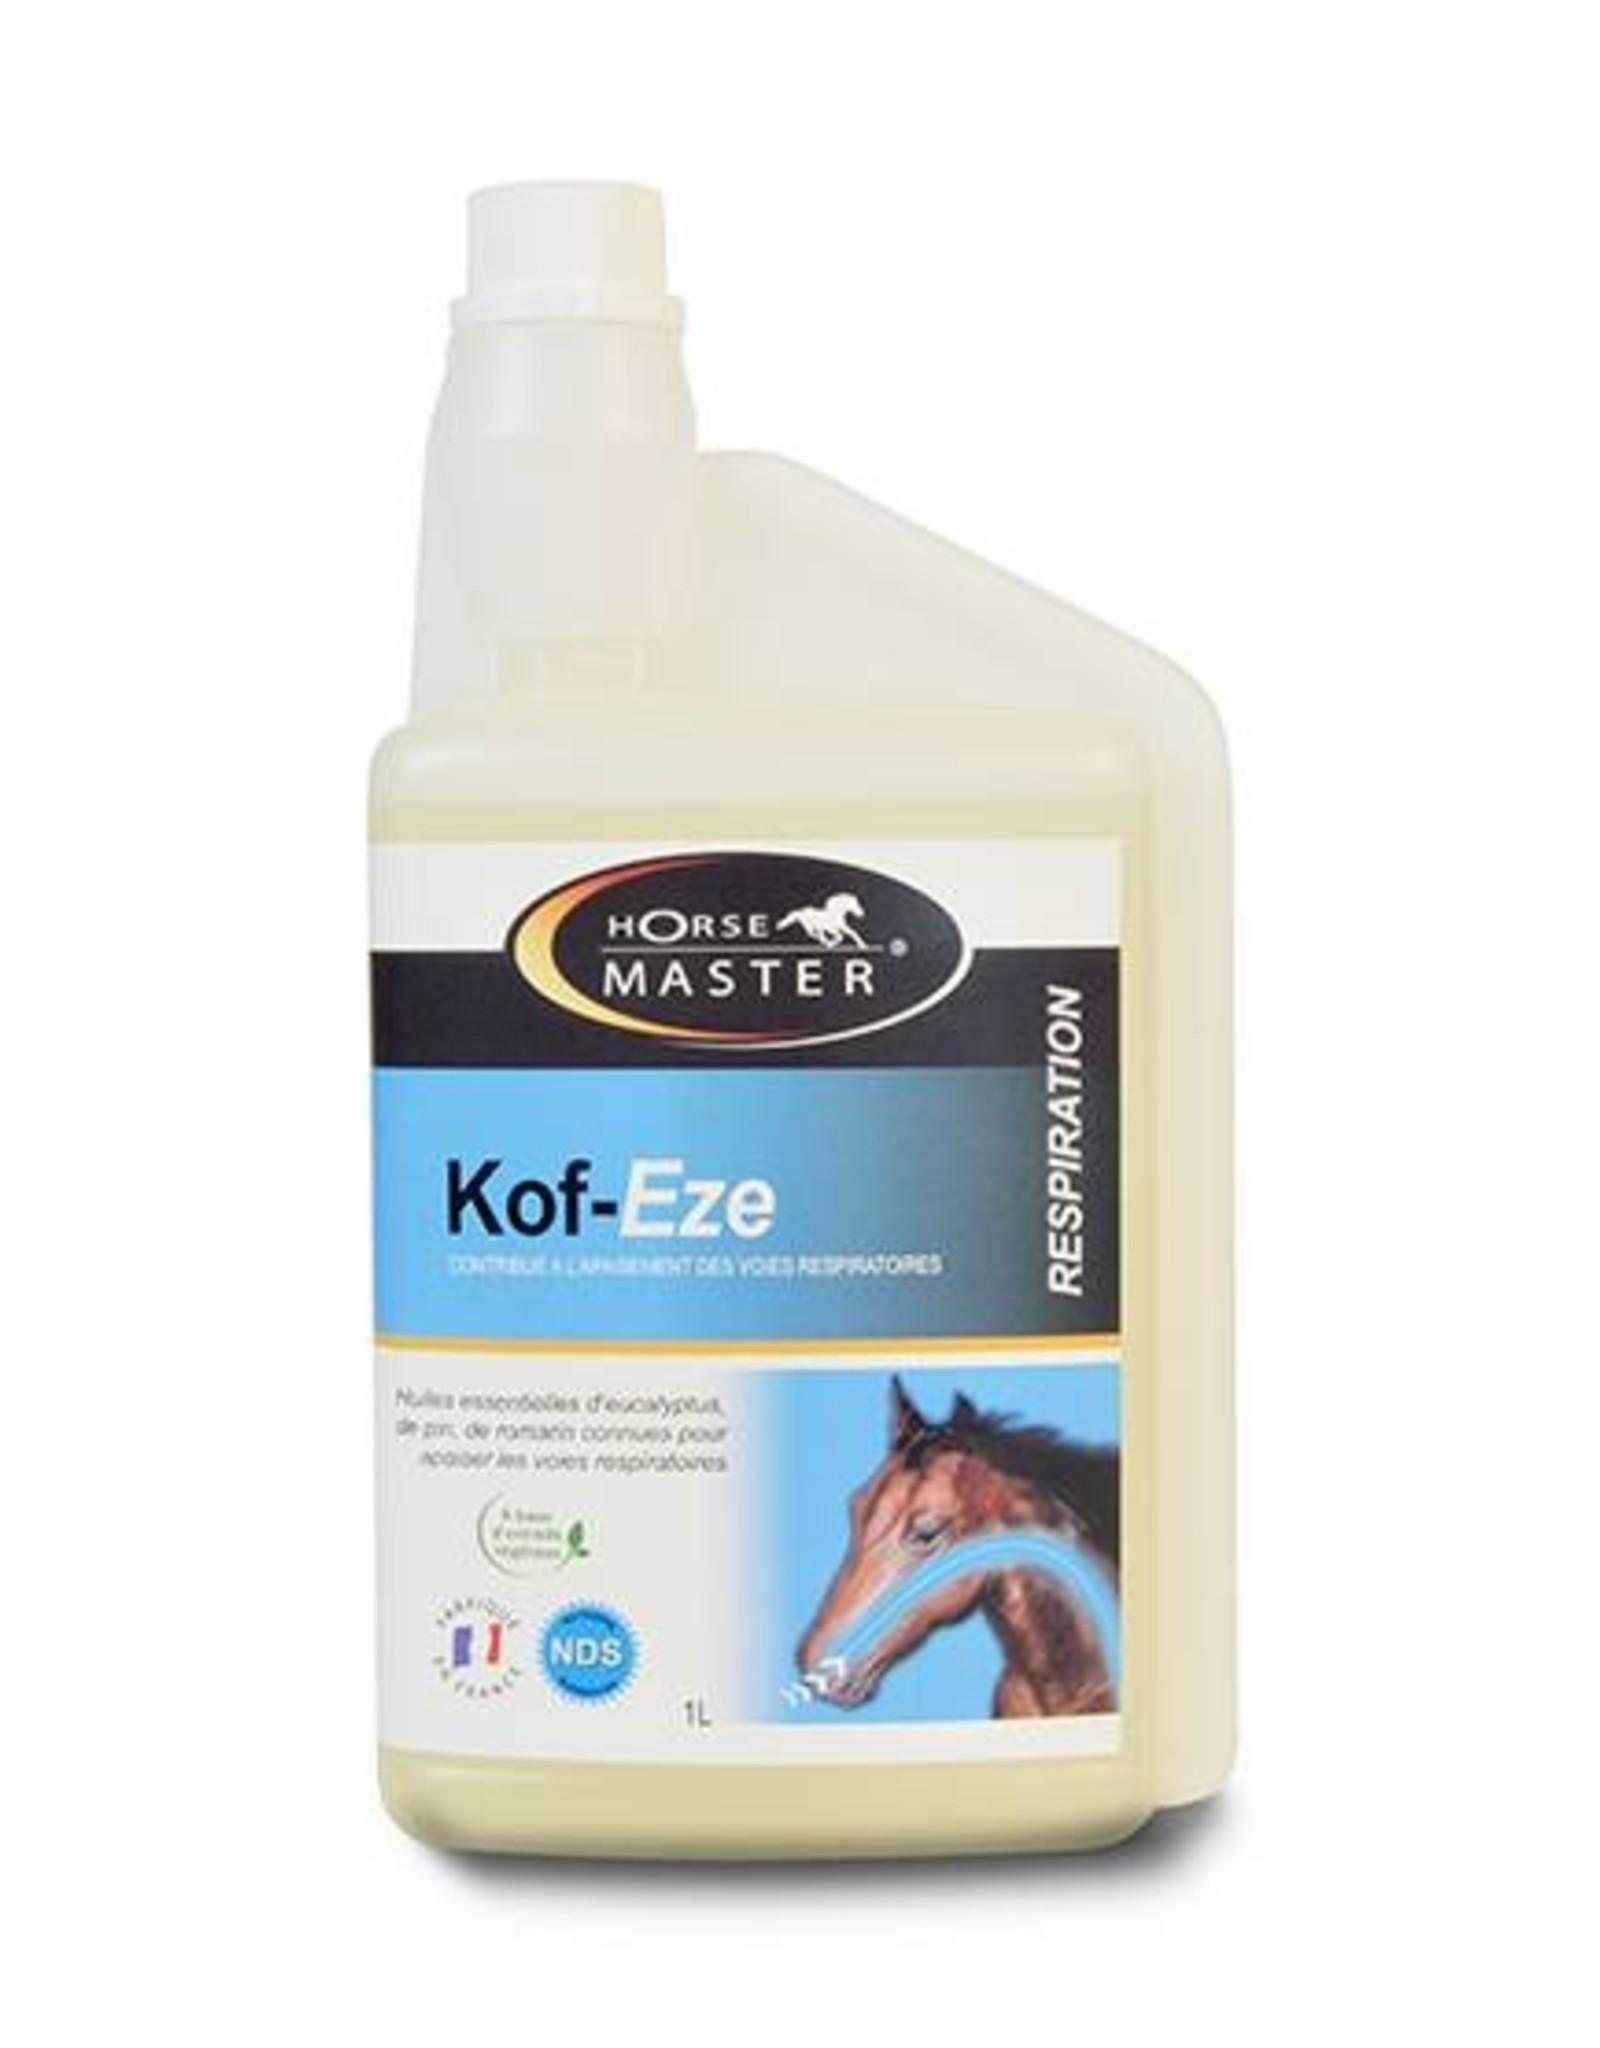 Horse Master Kof Eze